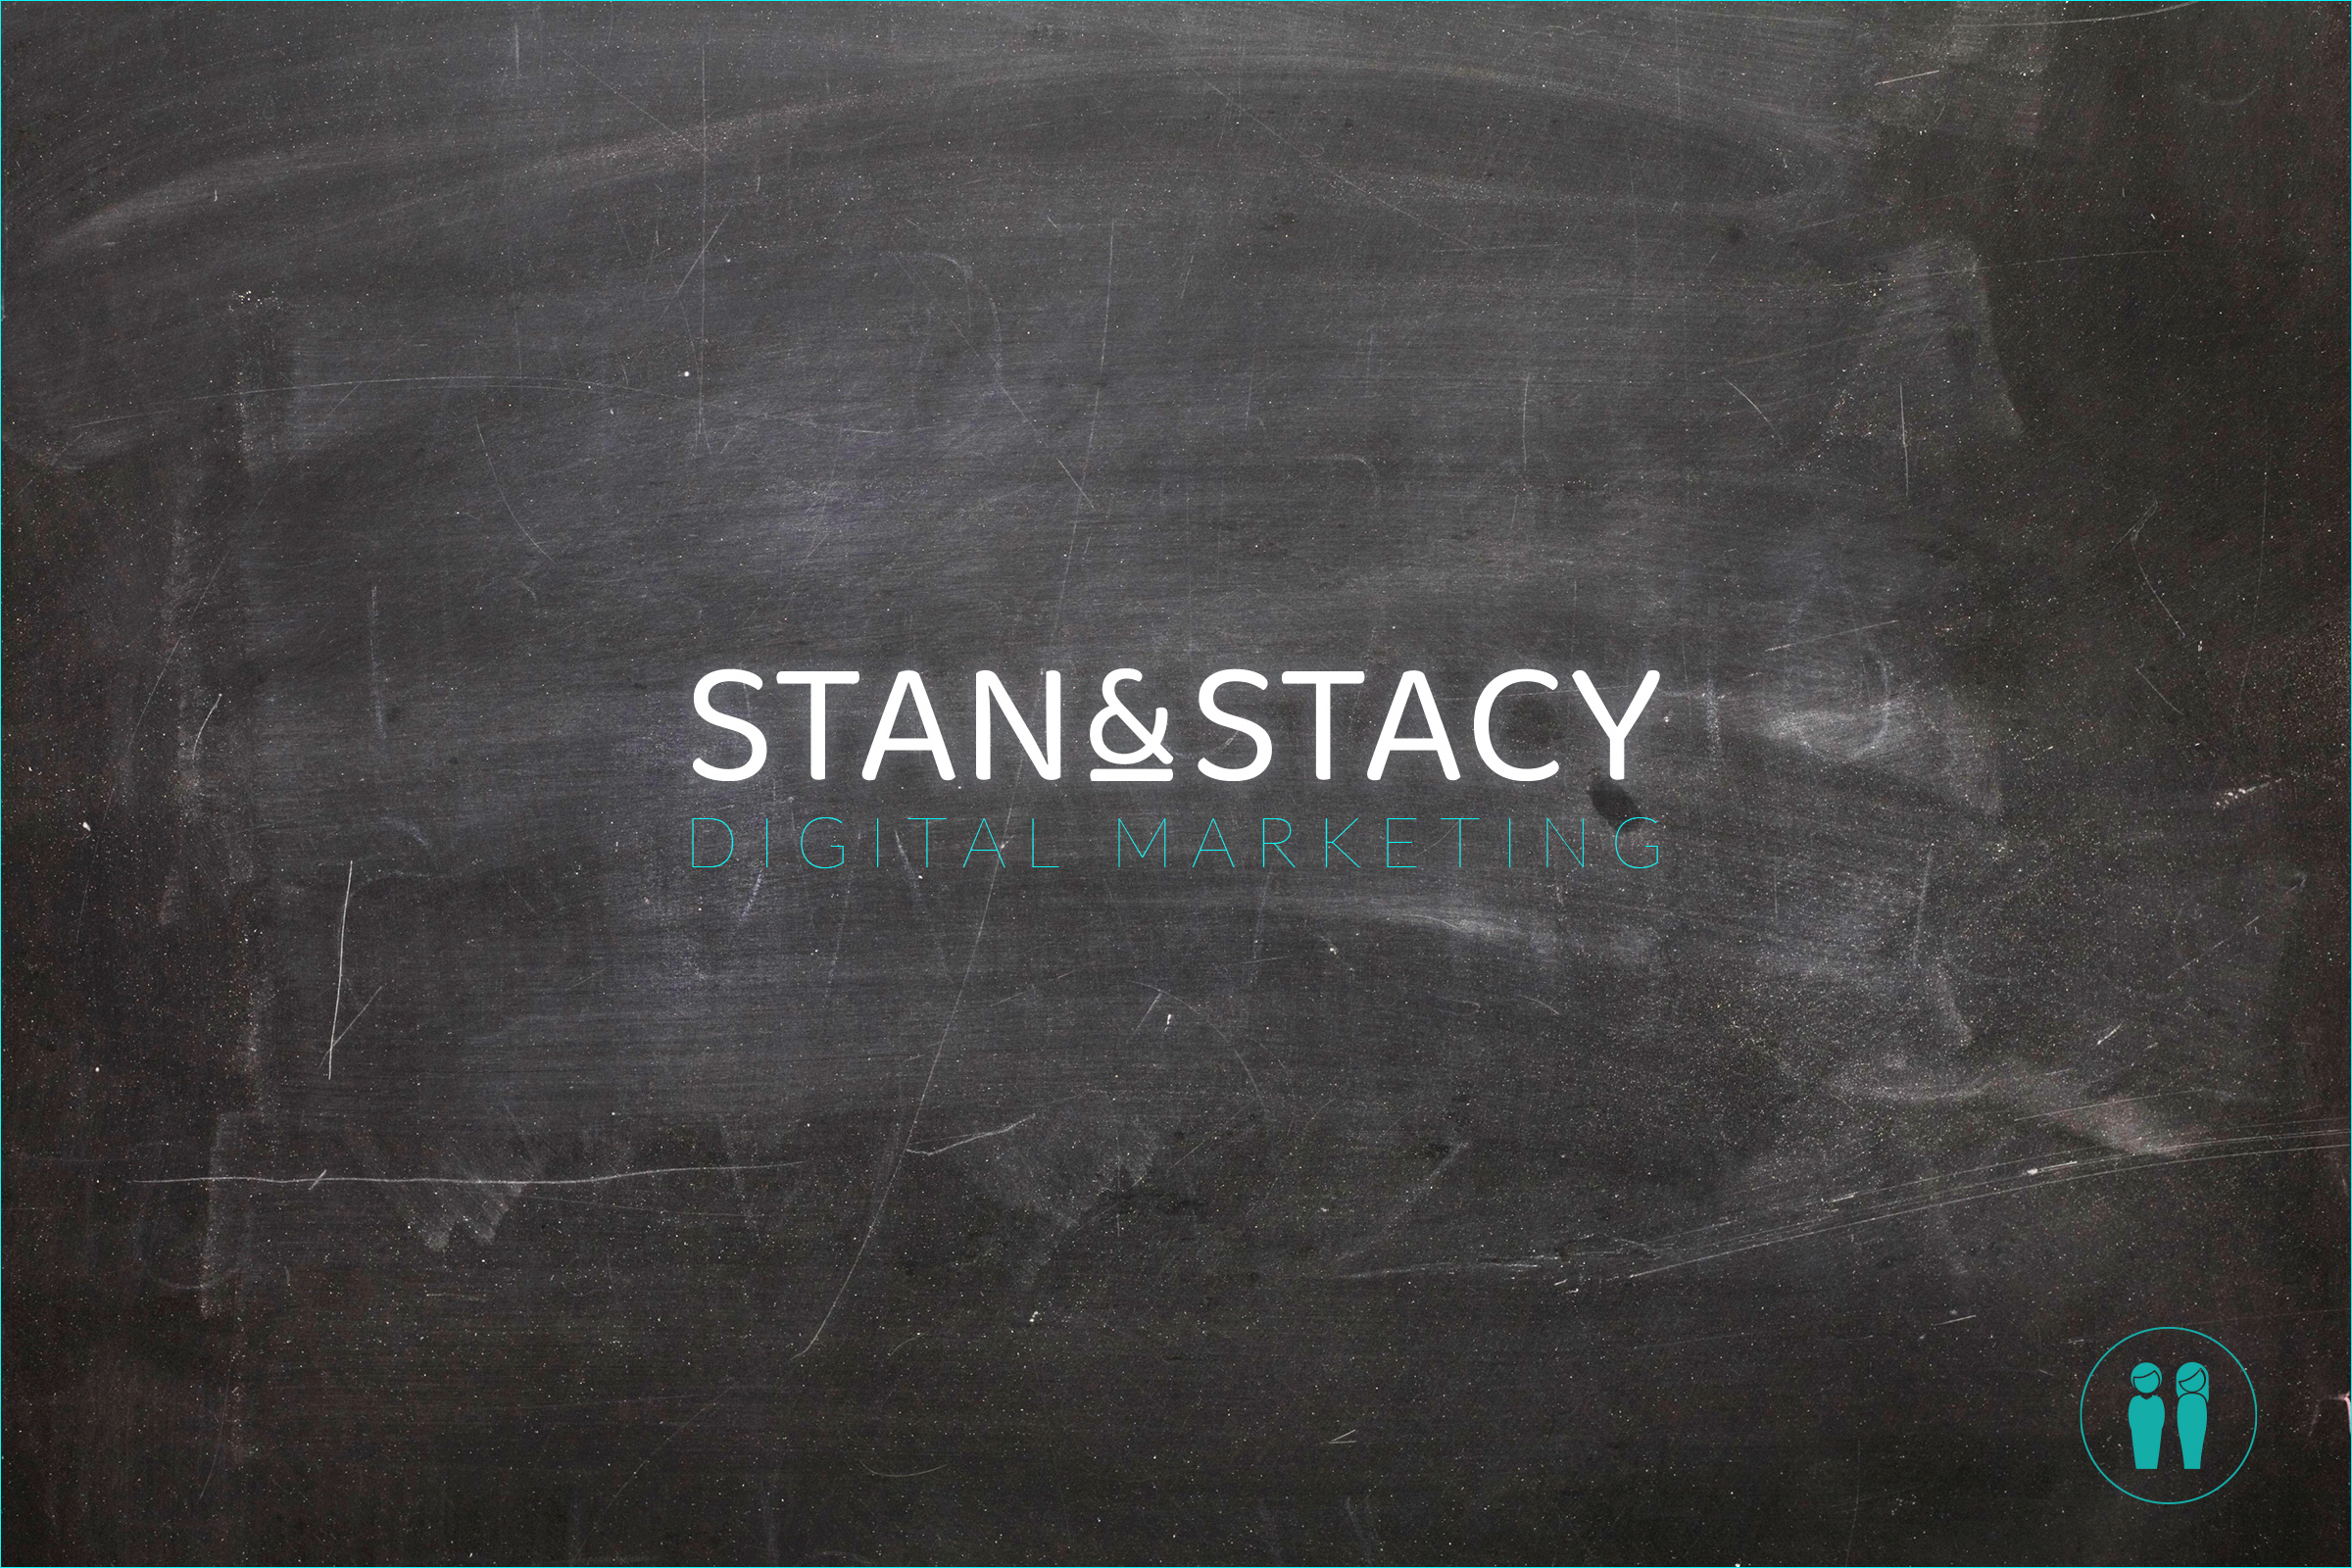 Stan & Stacy online marketing bureau